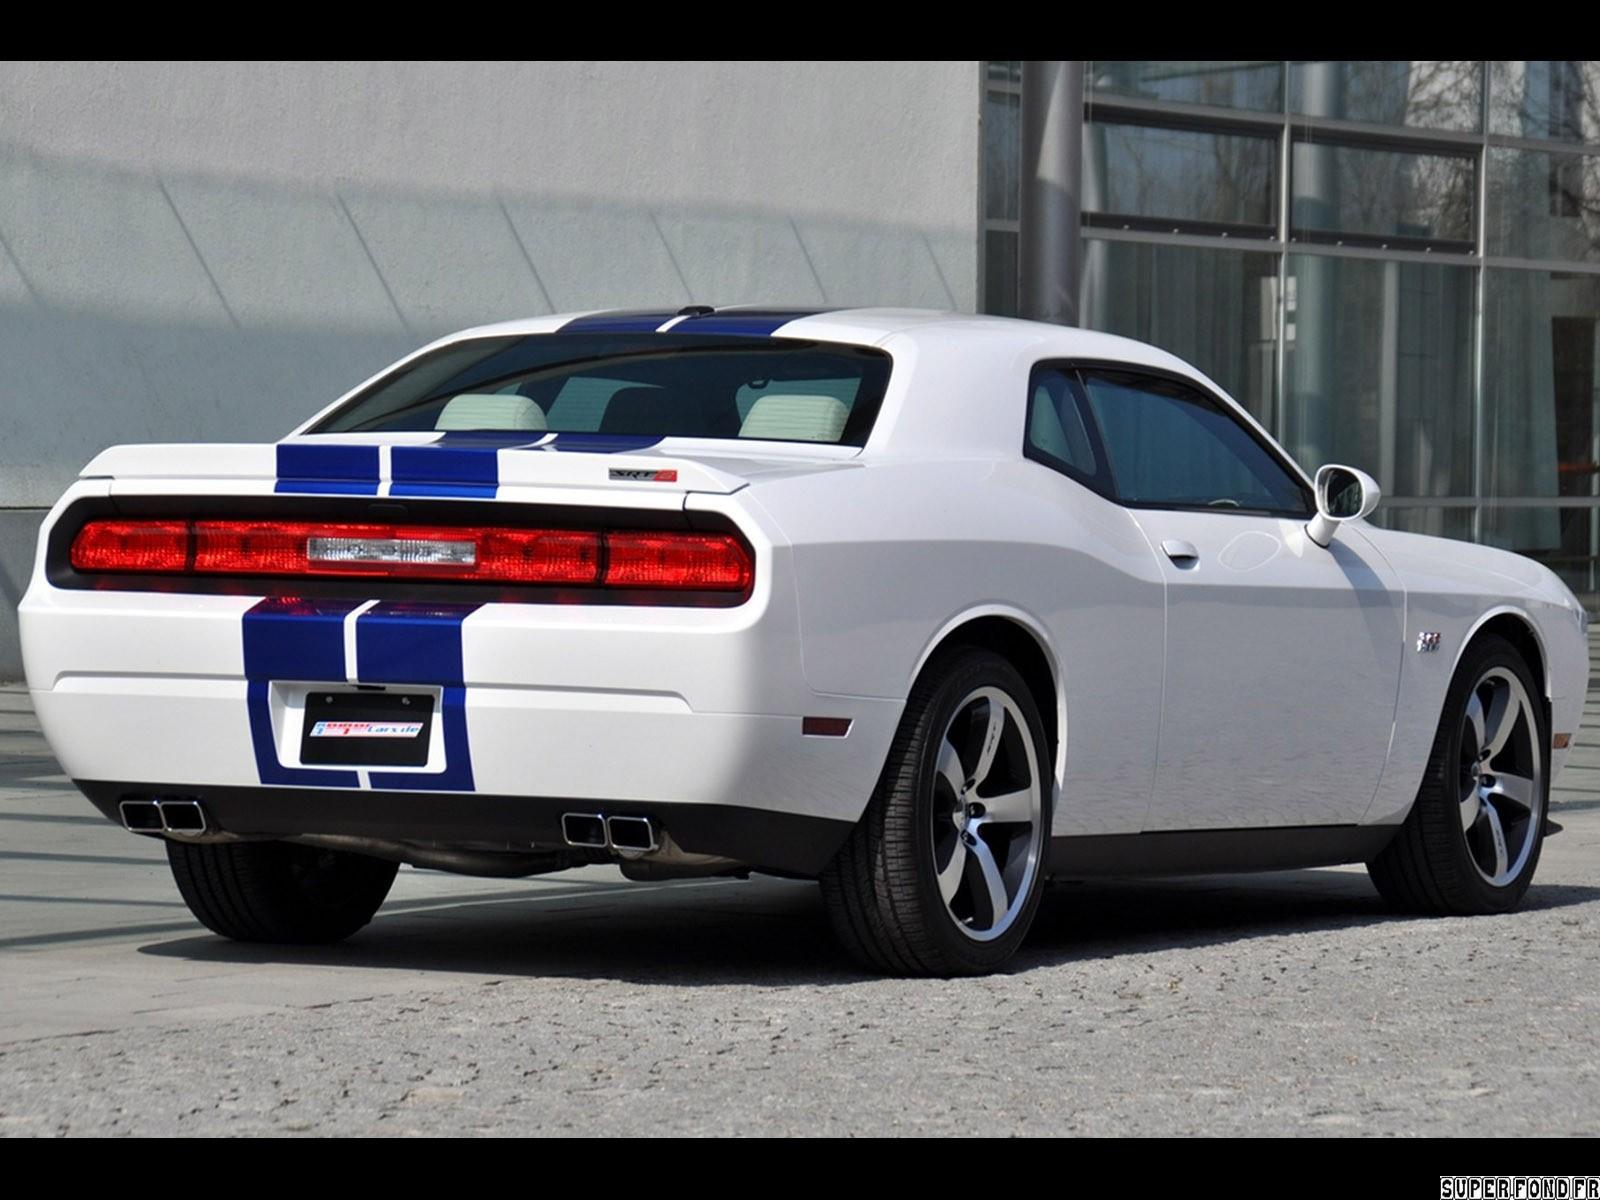 2011 Geigercars - Dodge Challenger SRT8 392